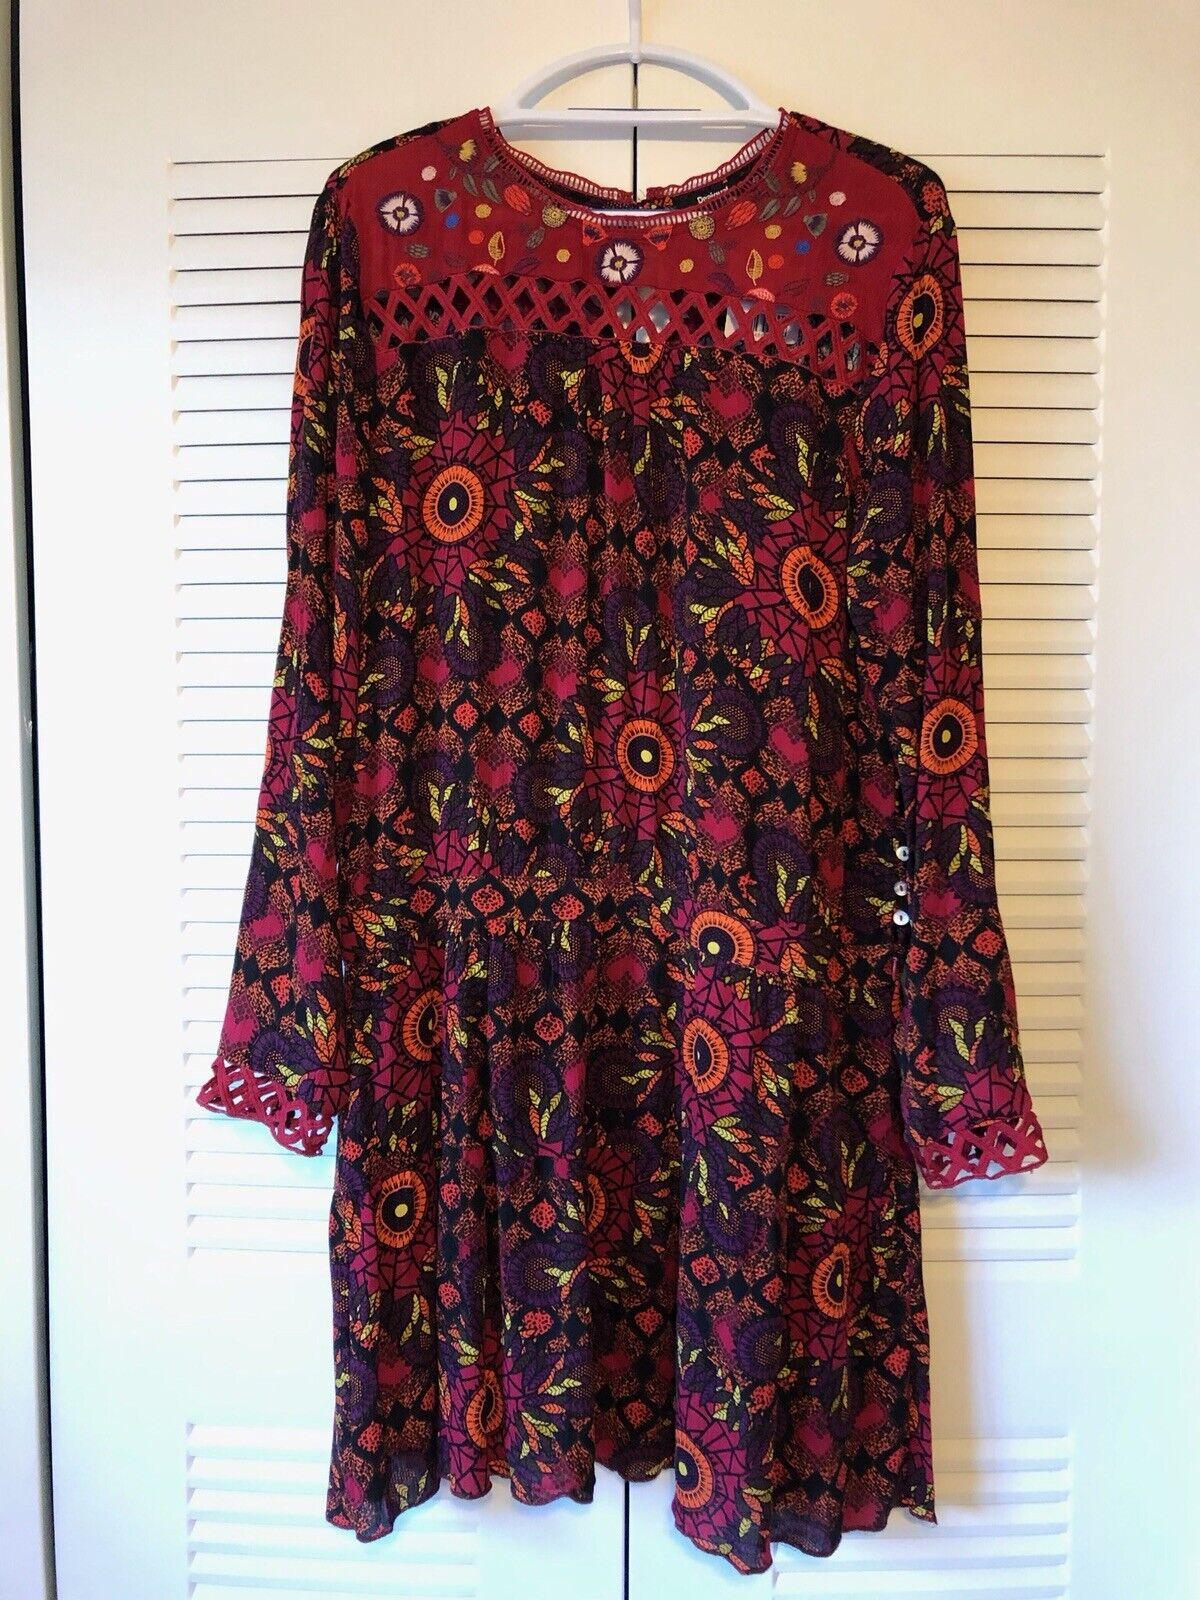 Desigual Robe Rosi rednanja red Dress NWT Size 42Eu US8